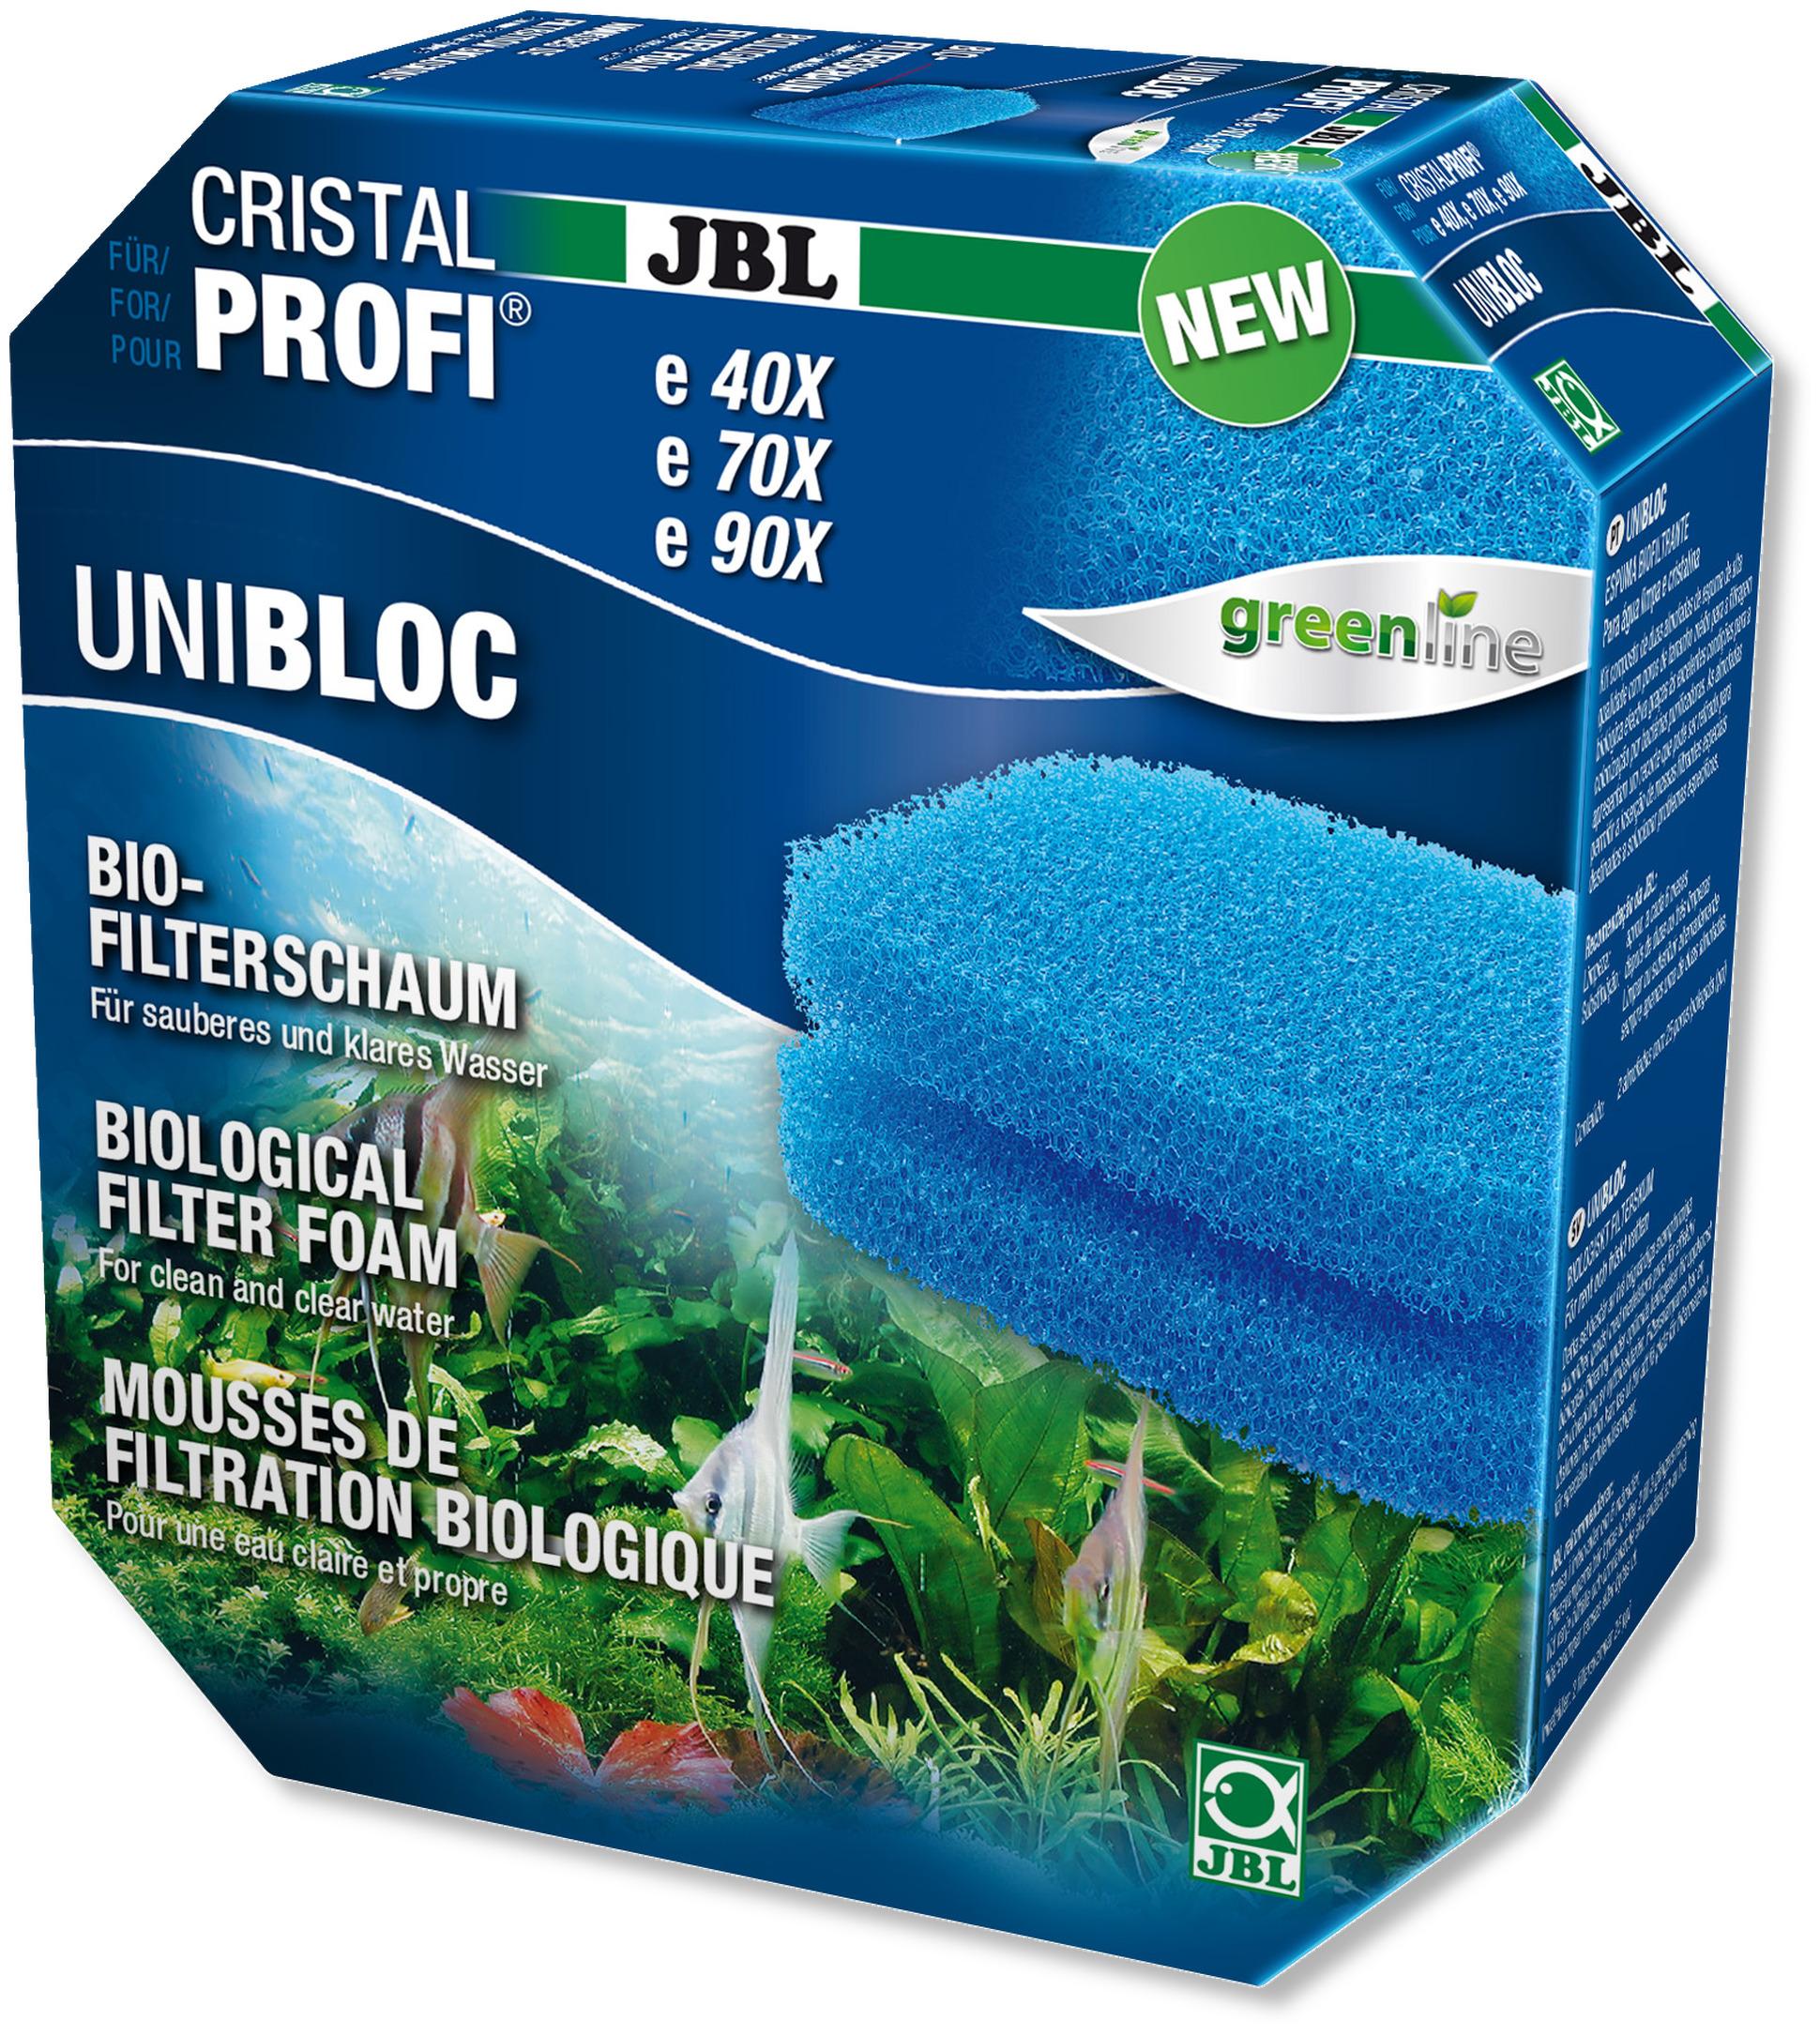 JBL UniBloc mousse de filtration pour filtres externes CristalProfi e700, e900, e401, e701, e901, e402, e702 et e902